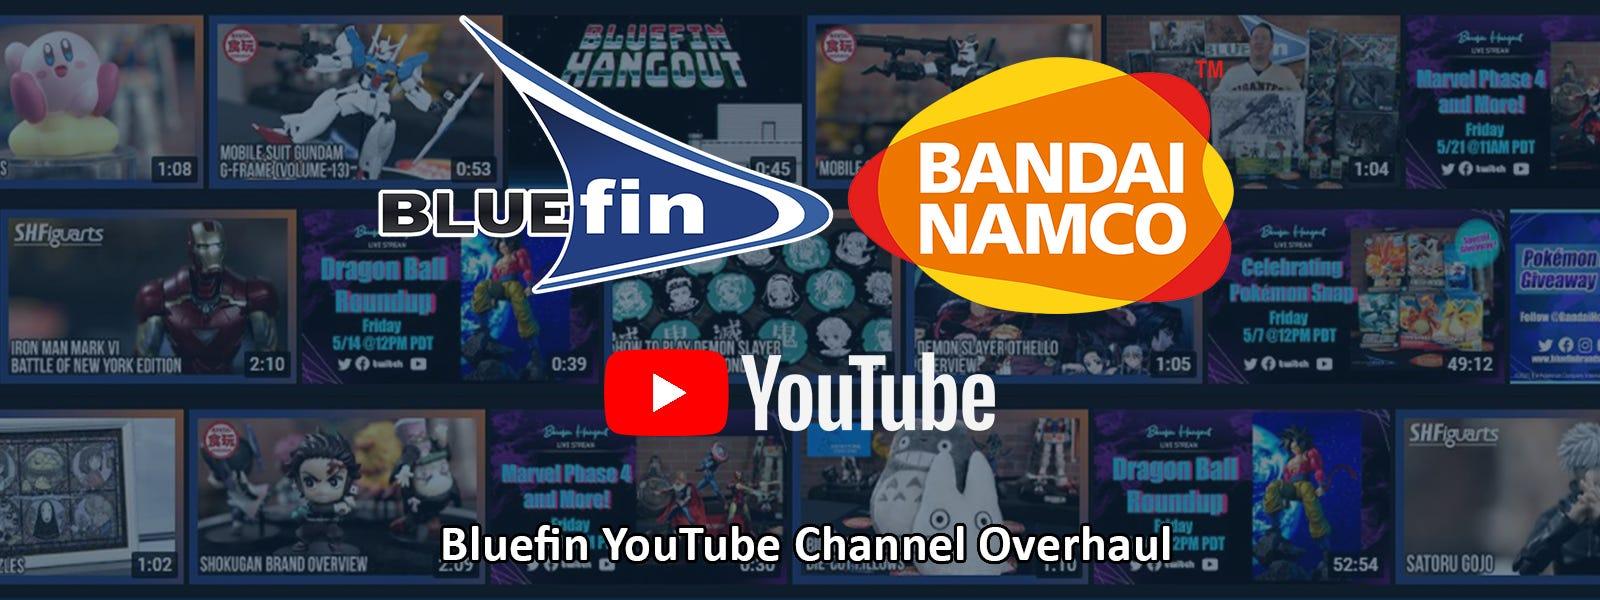 Bluefin YouTube Channel Overhaul